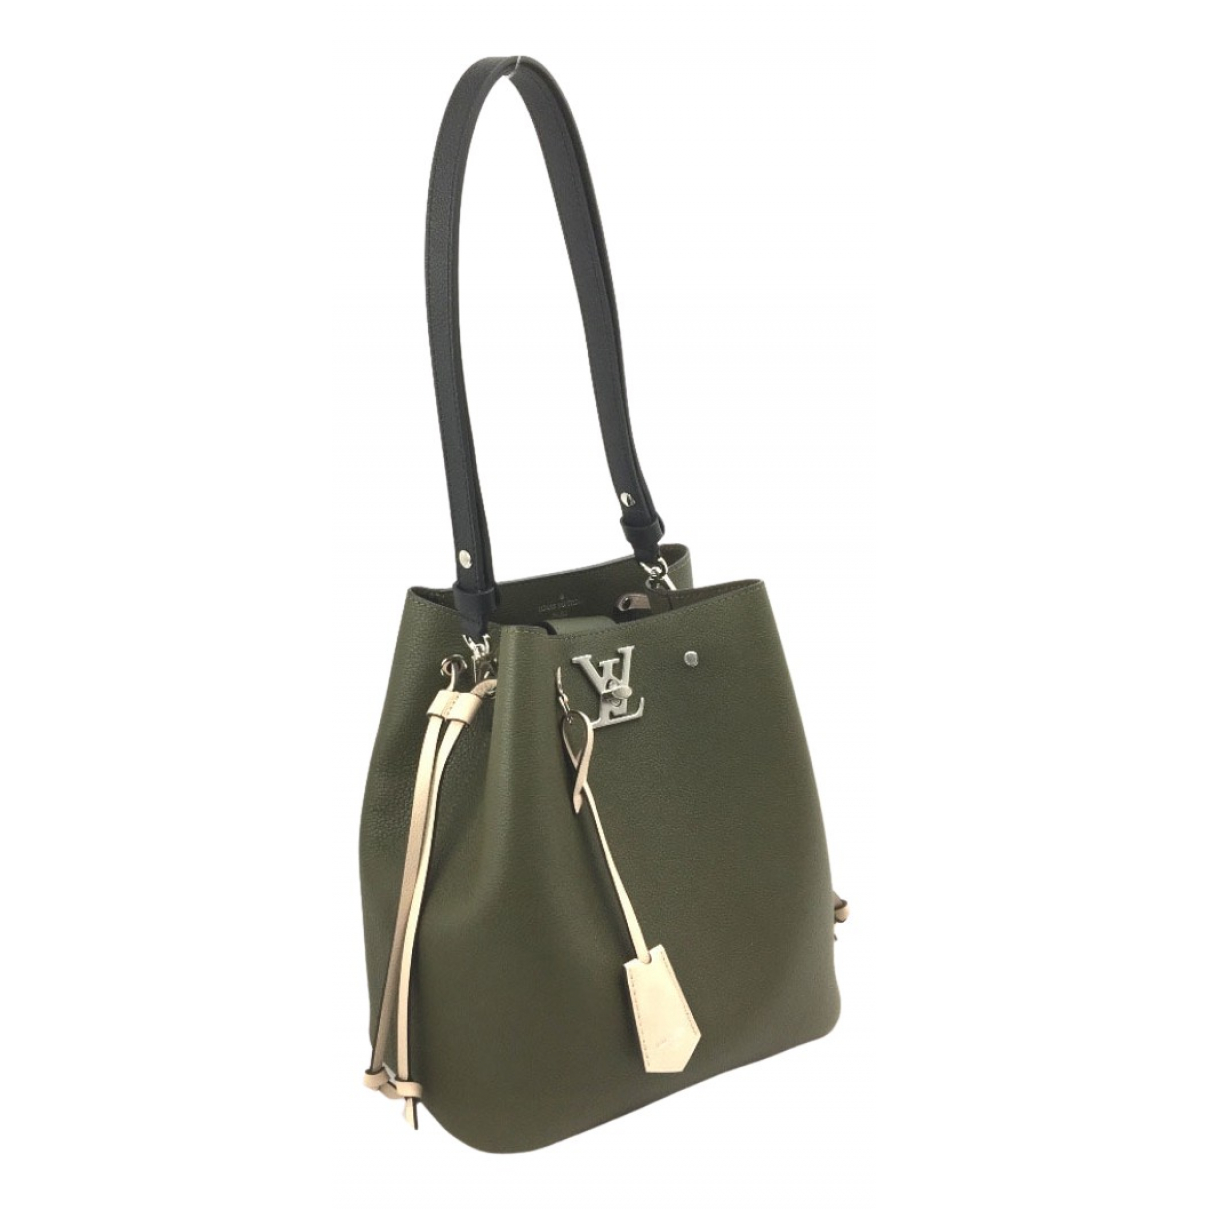 Louis Vuitton - Sac a main Lockme pour femme en cuir - vert